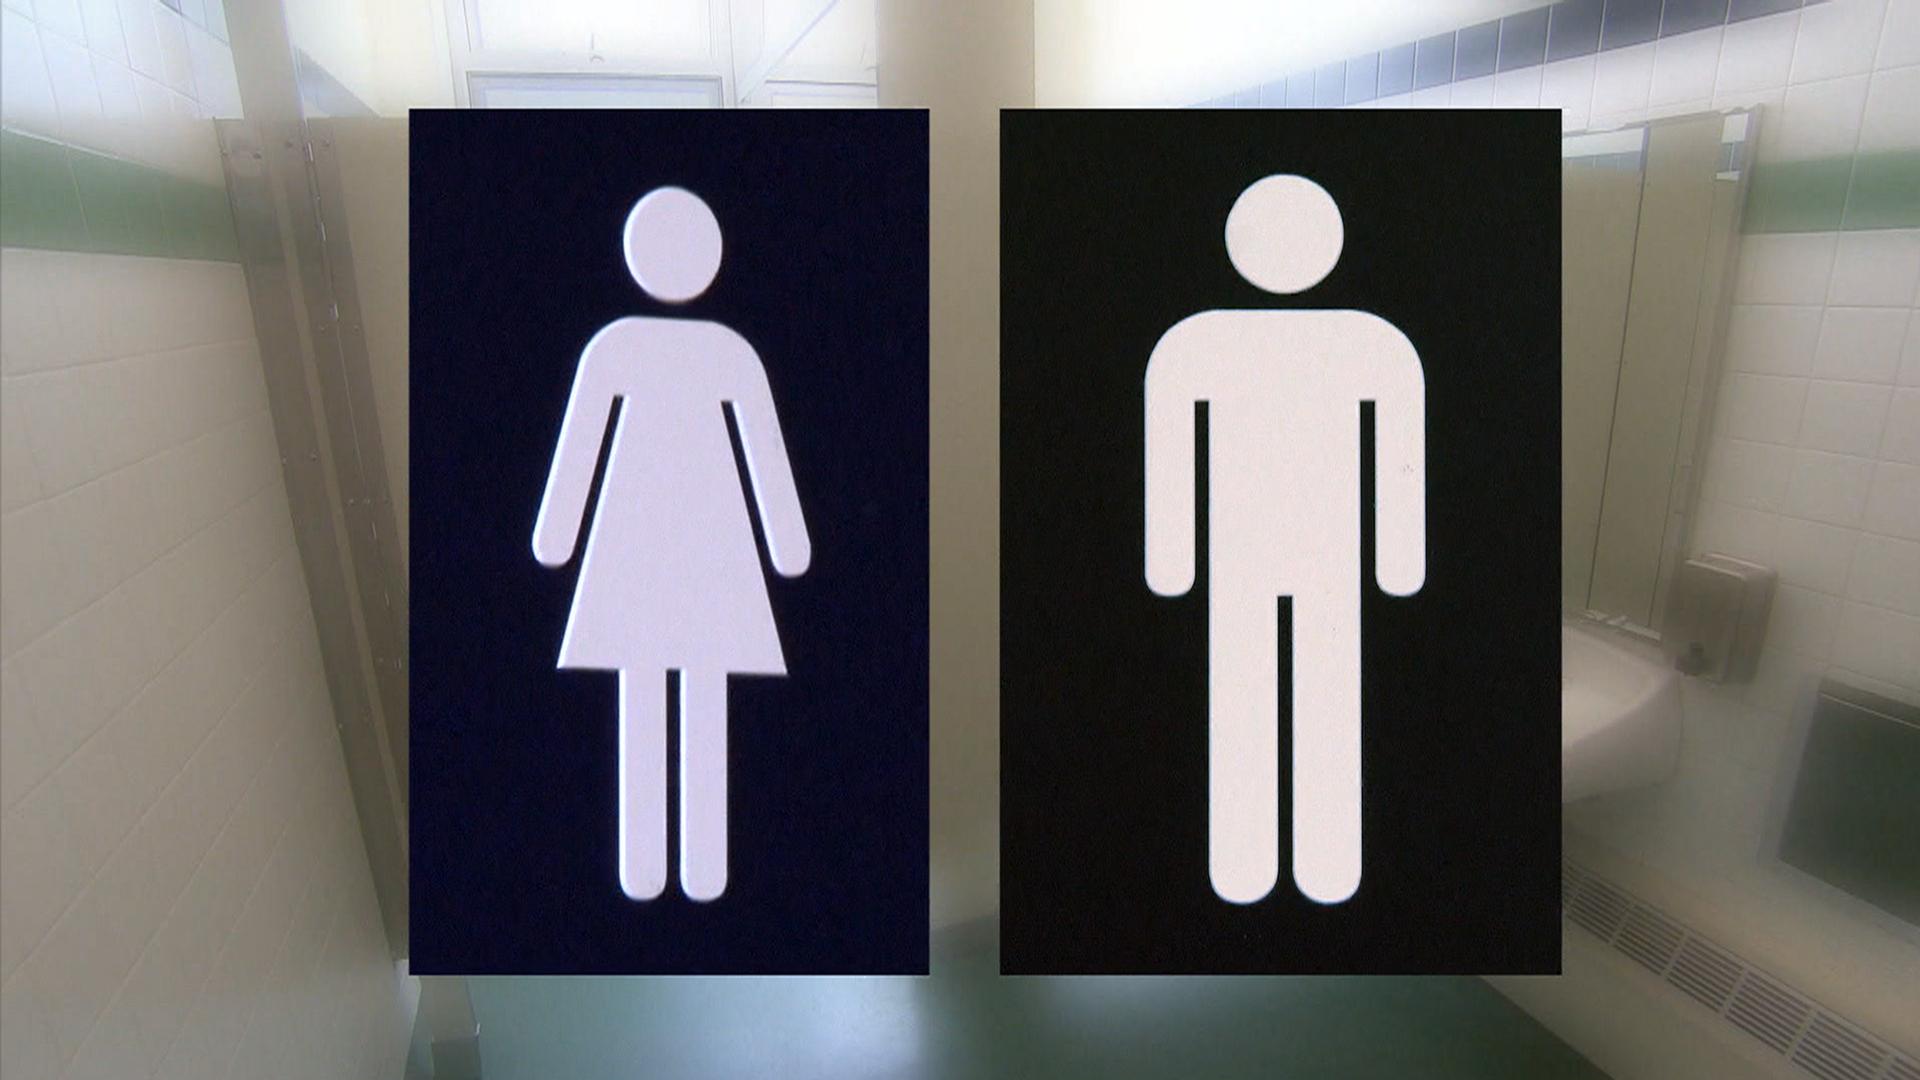 san francisco elementary school creates gender-neutral bathrooms